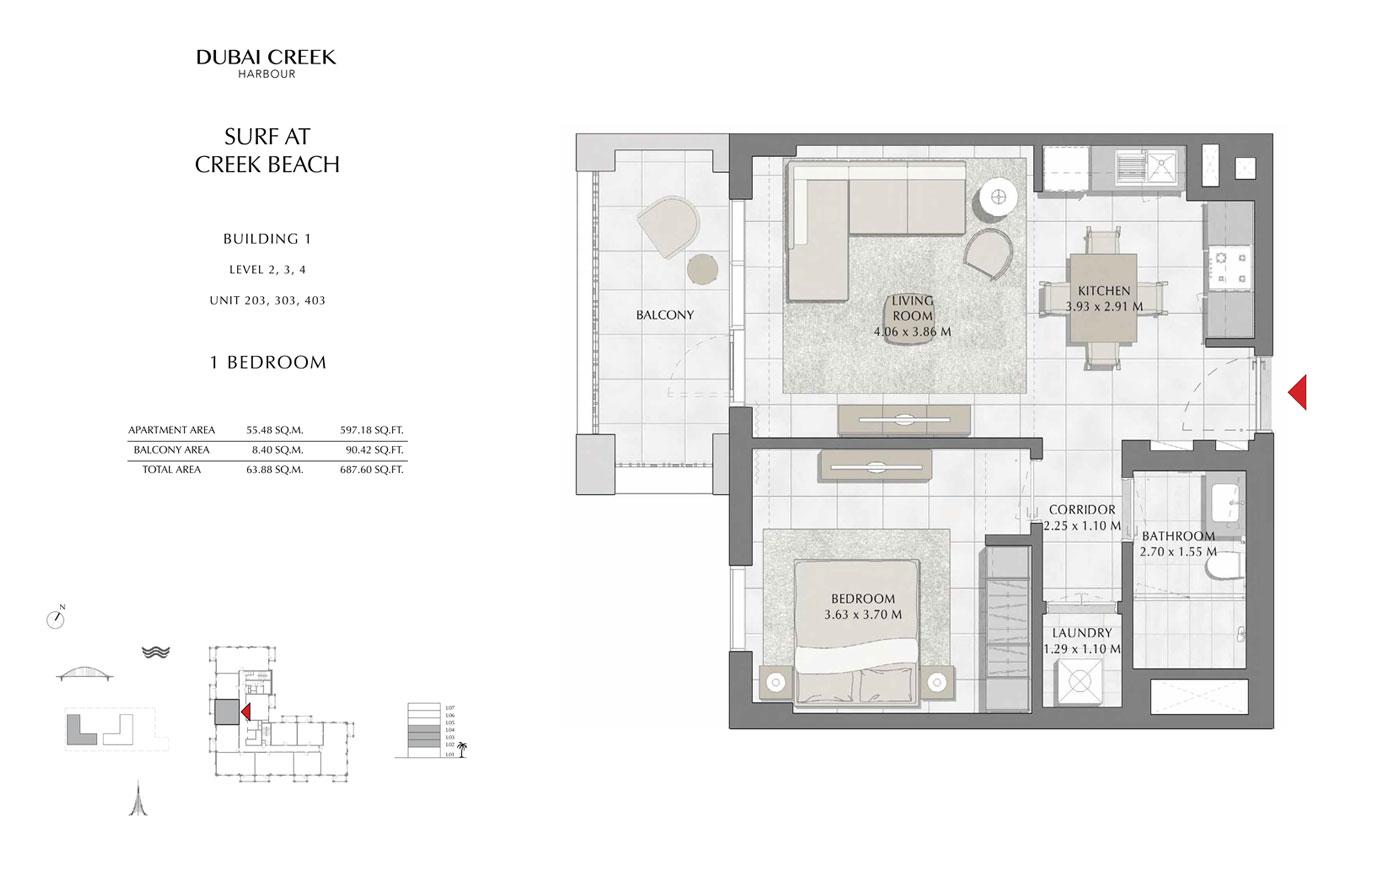 Building-1-1-Bedroom,-Level-2-3-4,-Unit-203-303-403,-Size-687 sq.ft